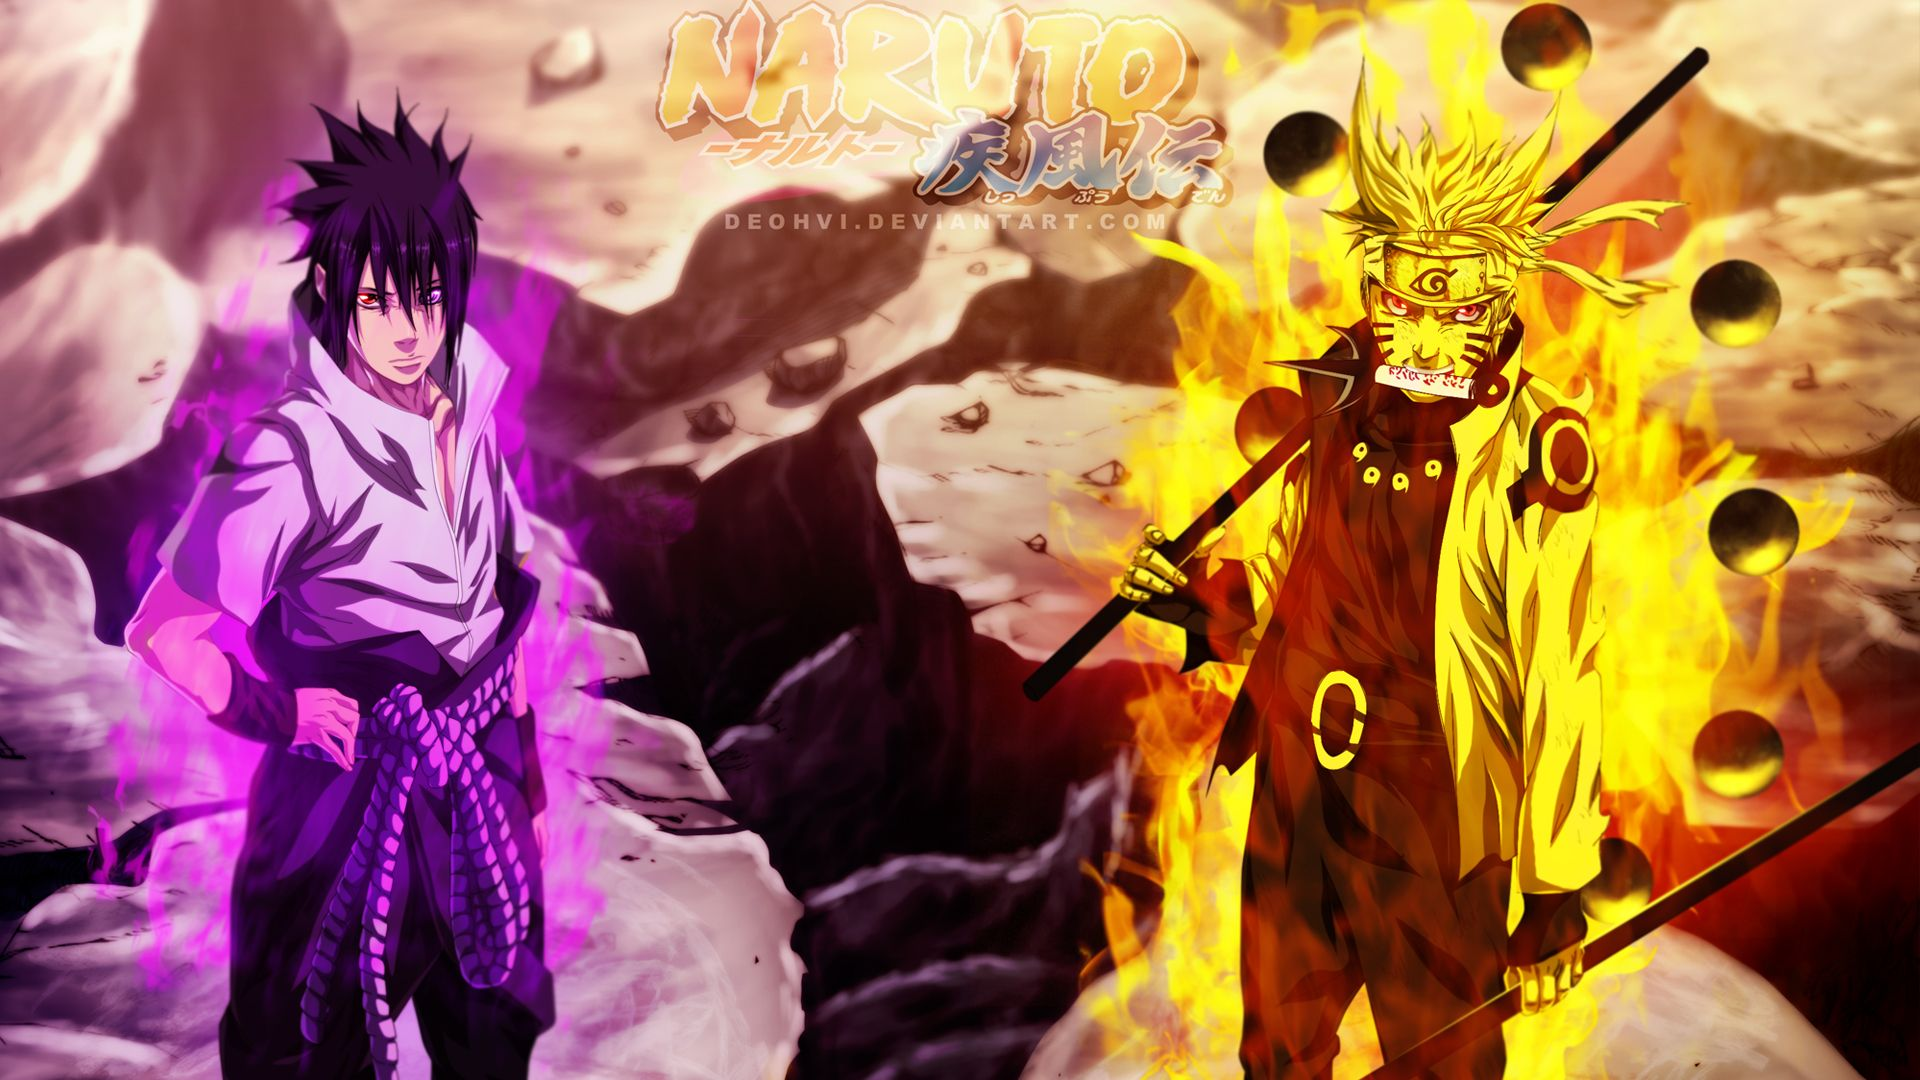 Sasuke and Naruto Sage mode